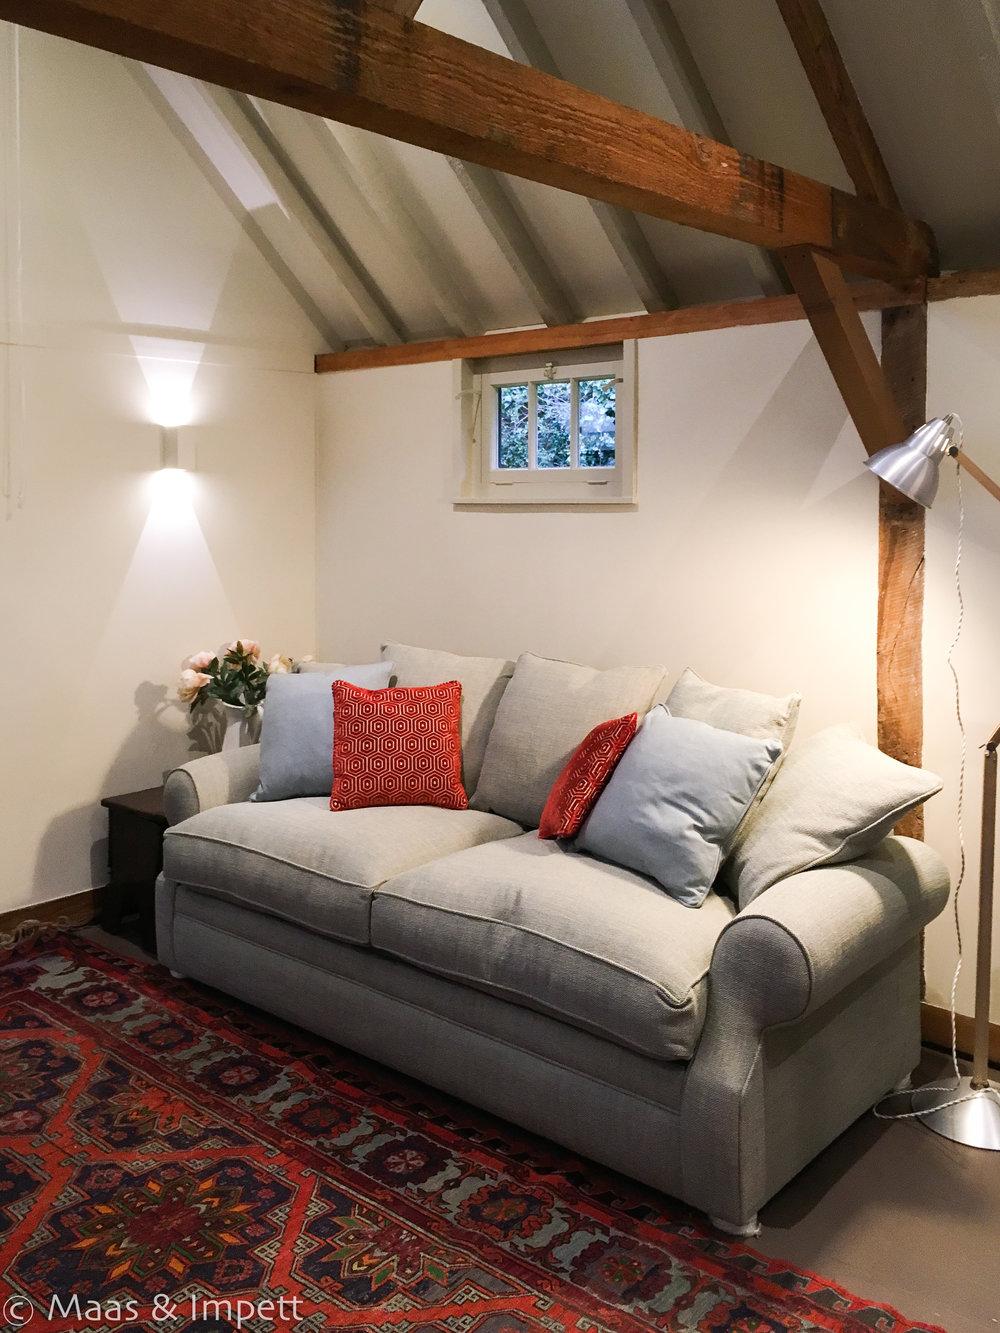 Building conversion Interior Design by Maas & Impett, Lymington